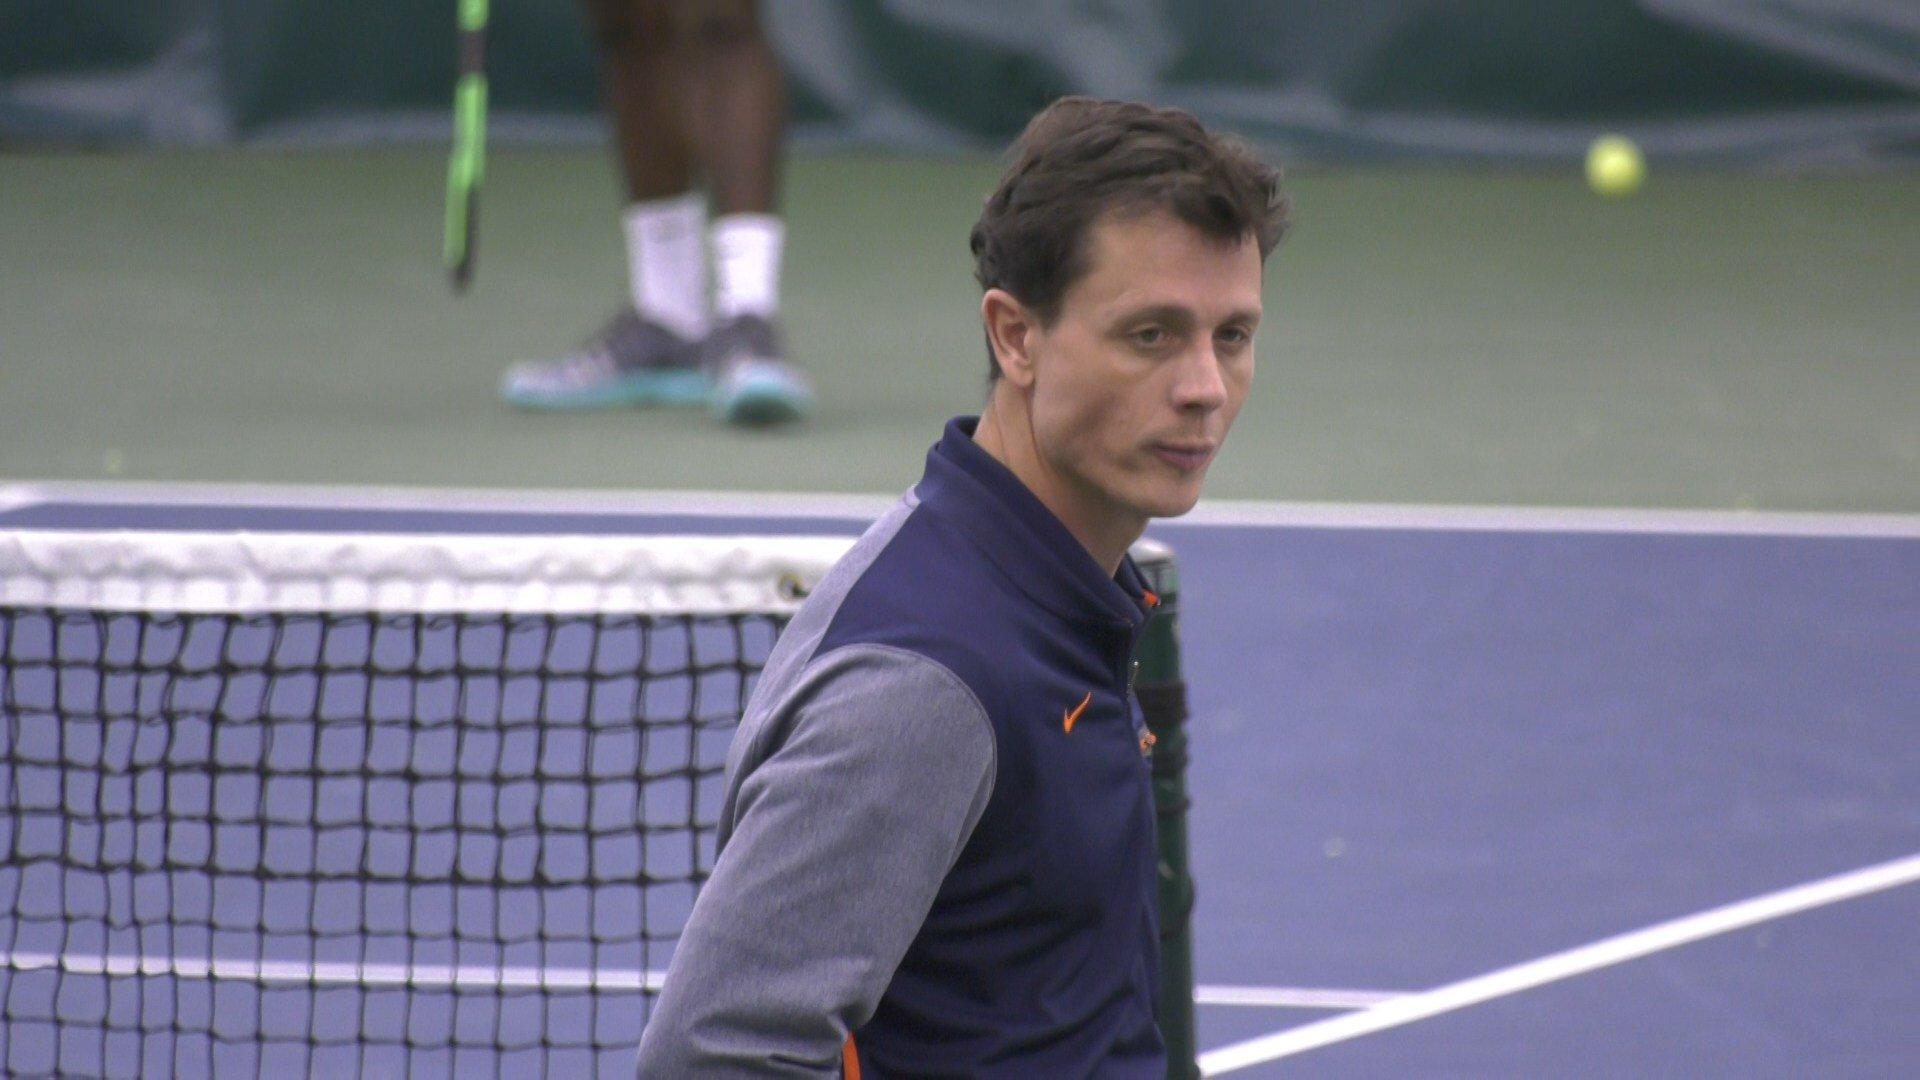 Virginia head coach Andres Pedroso